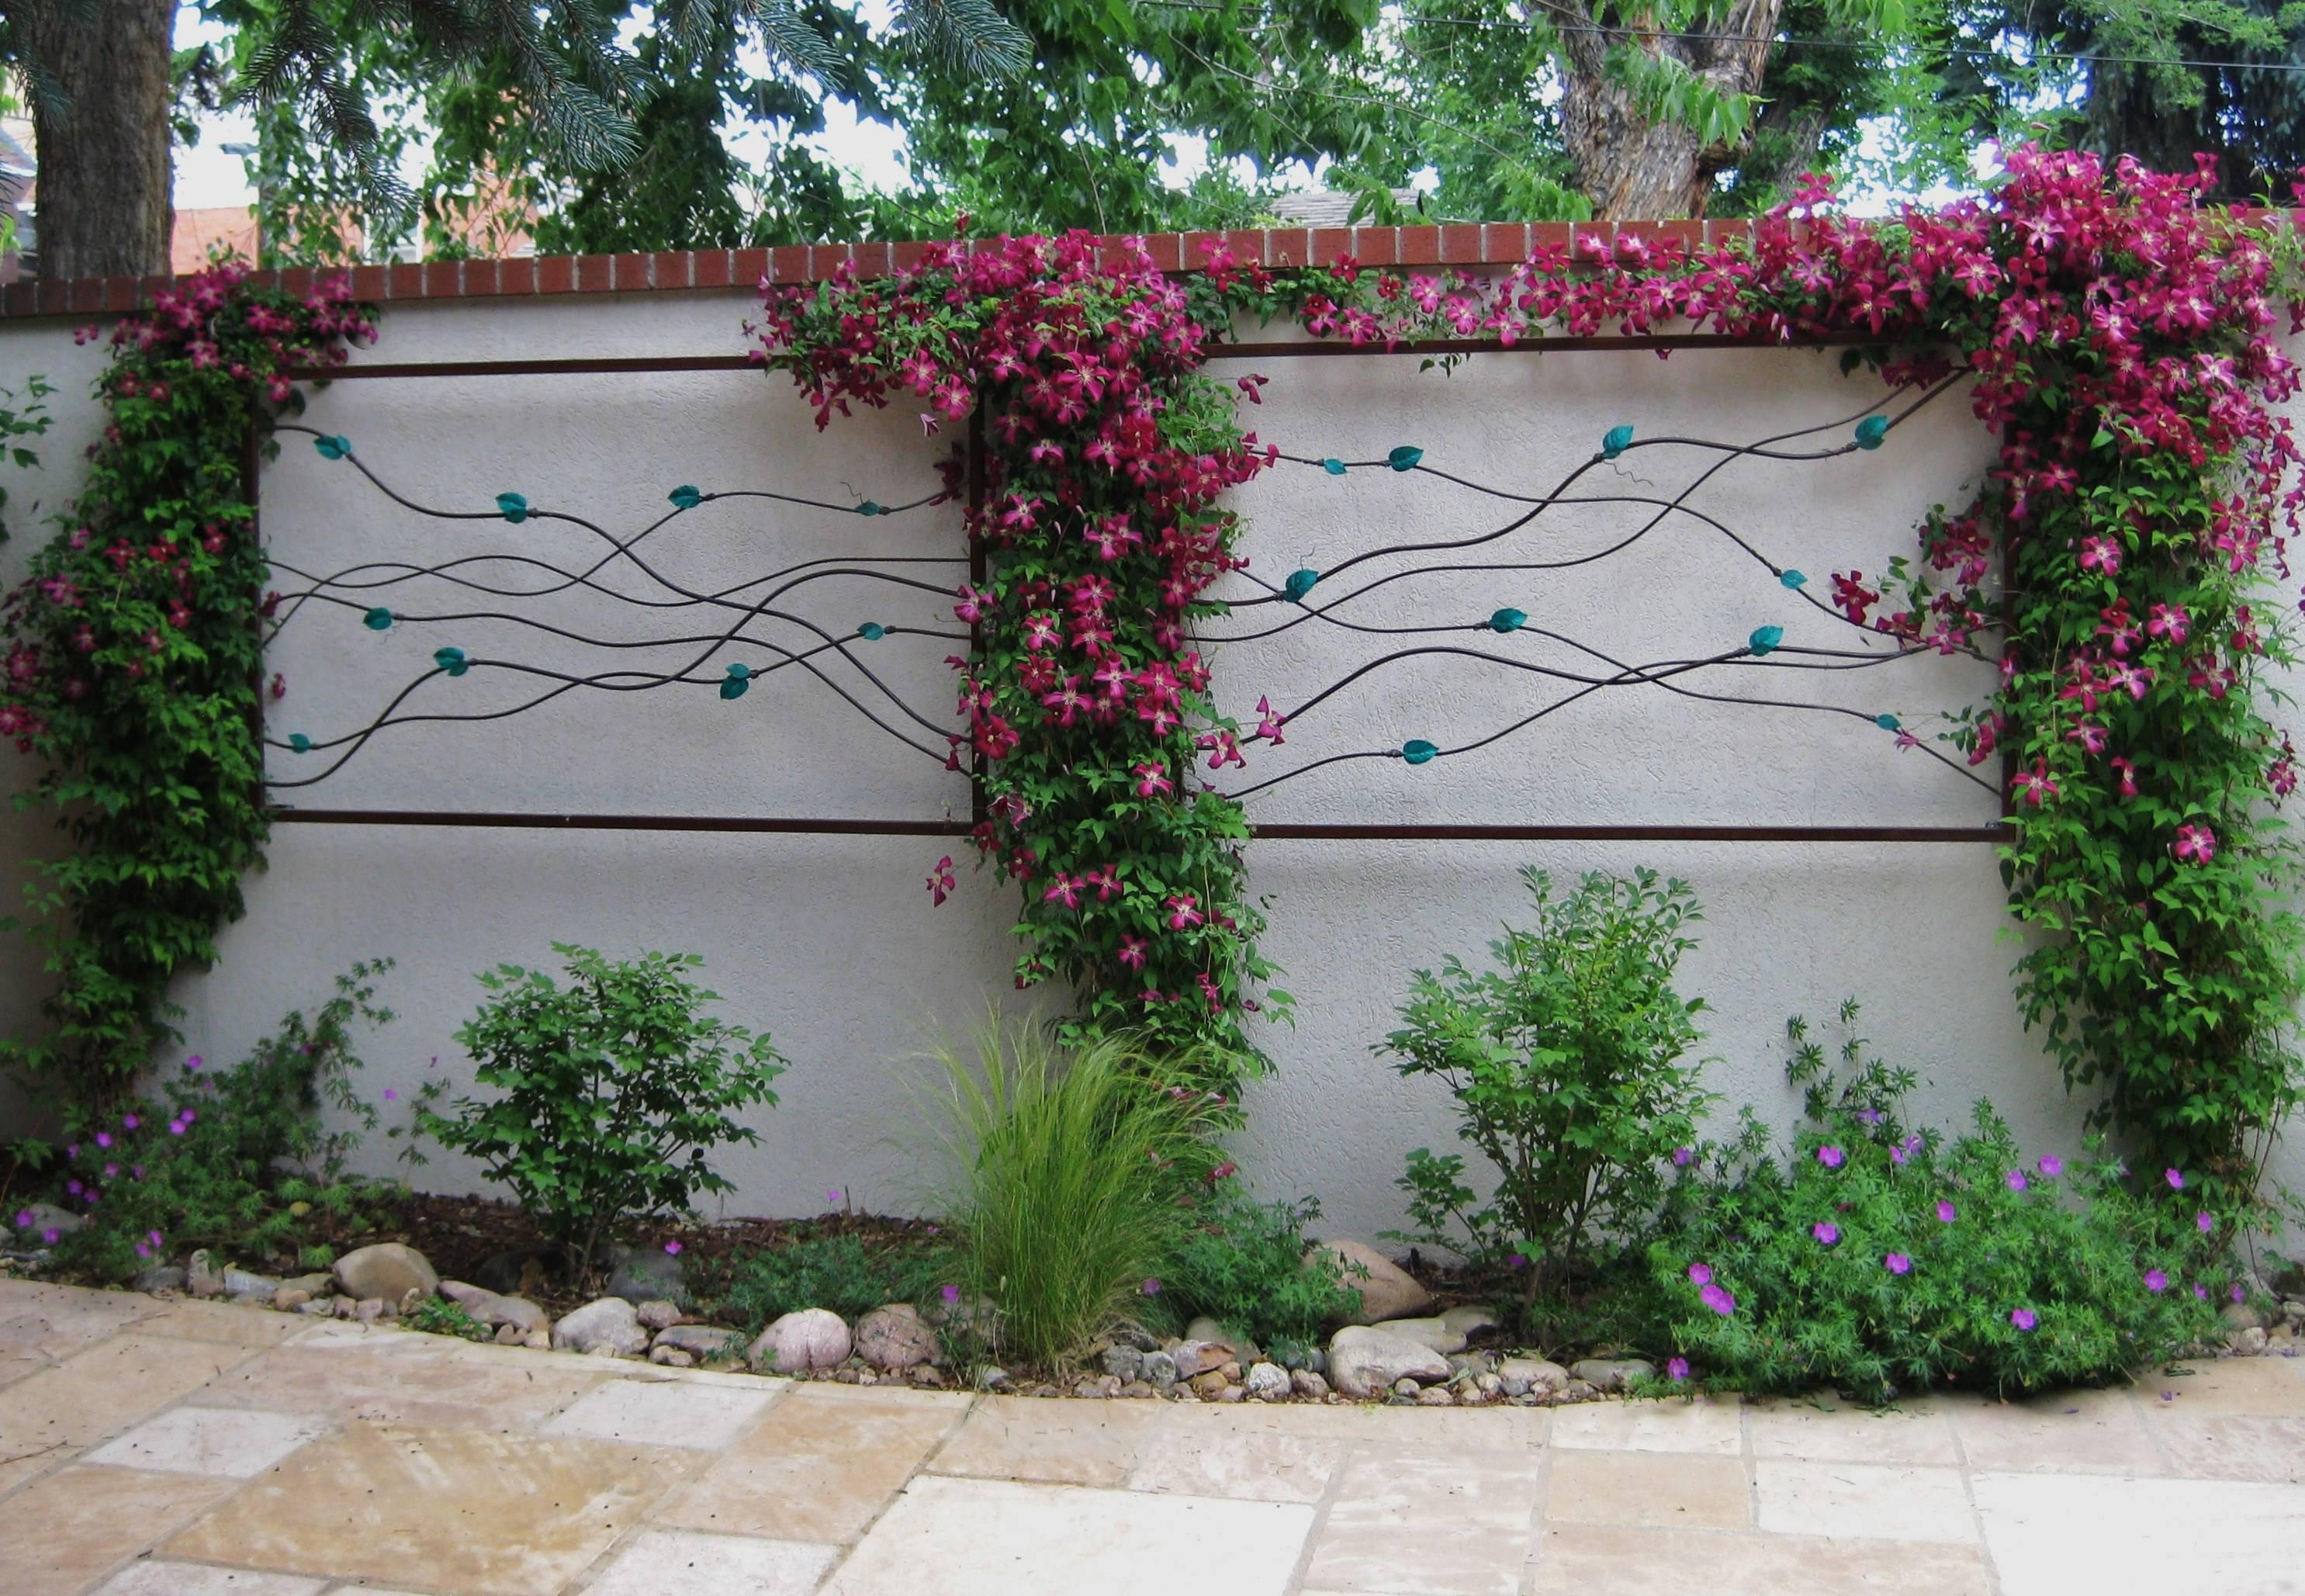 Wall Art Designs: Garden Wall Art Framed Art With Leaves Flower Within Most Popular Garden Wall Art (View 9 of 30)